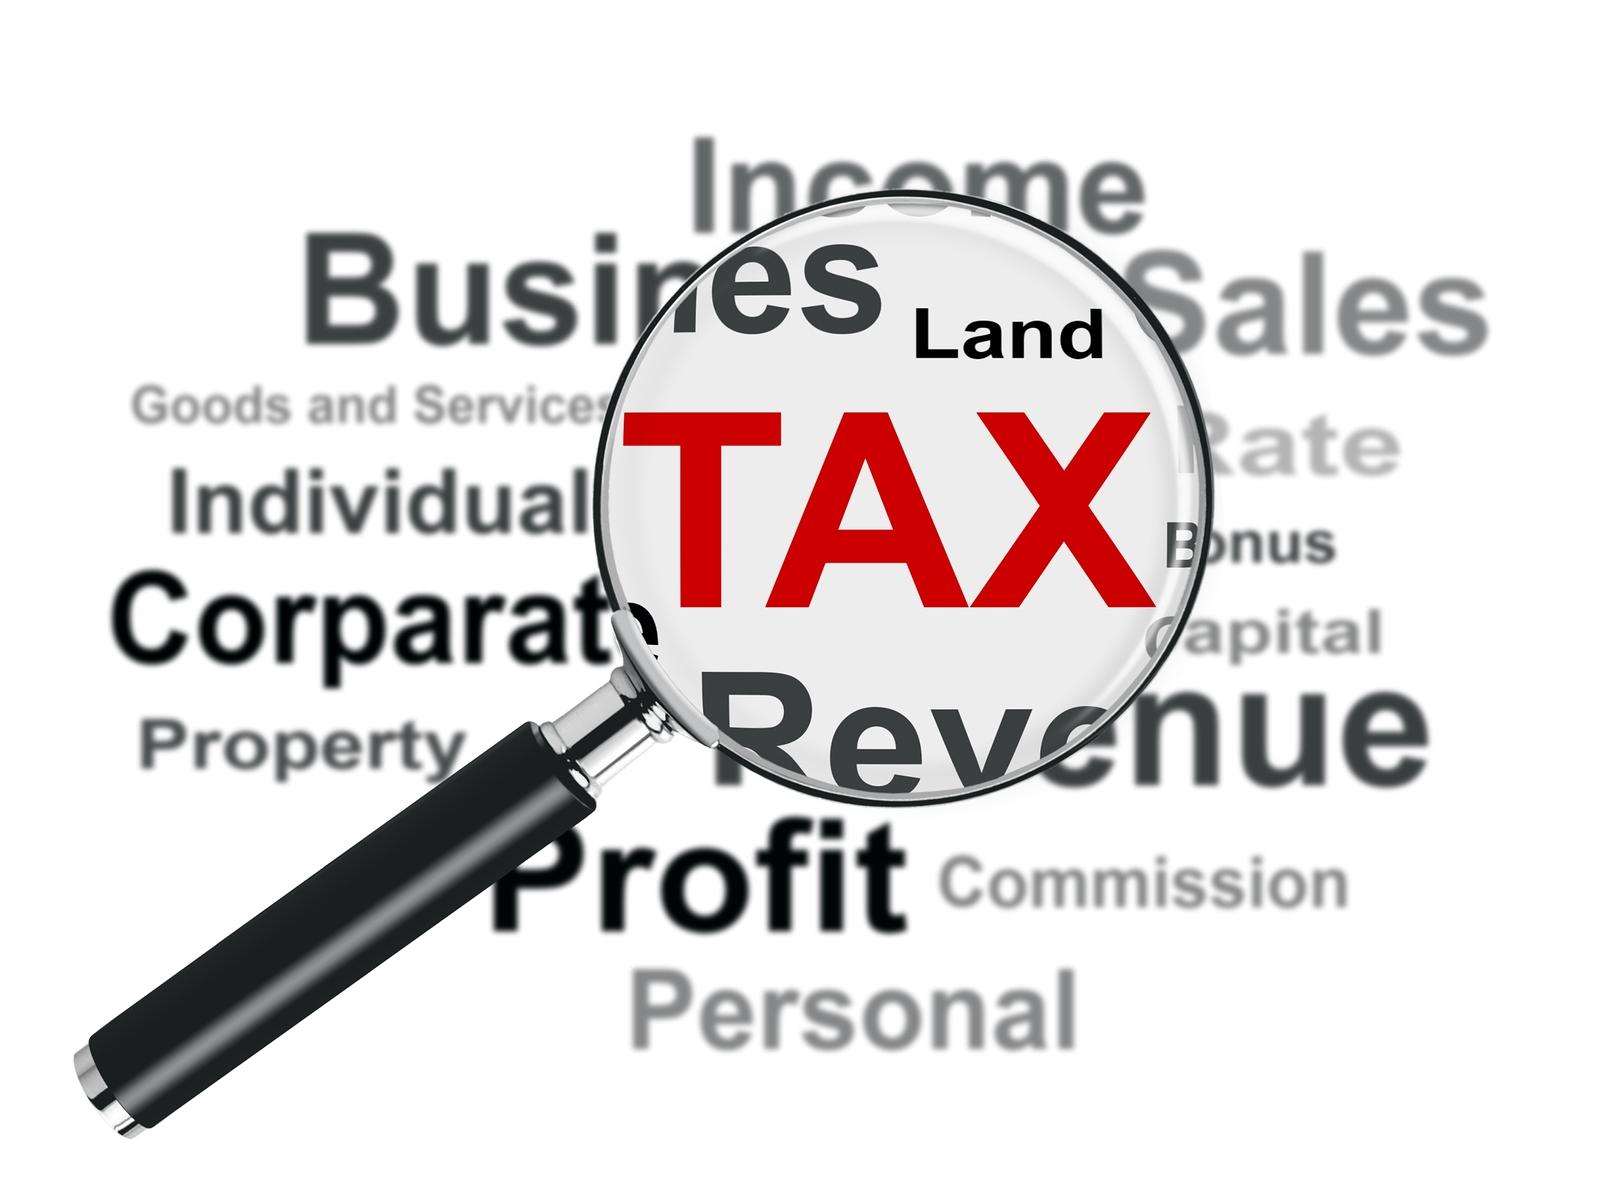 Tax-deferred_Exchange.jpg